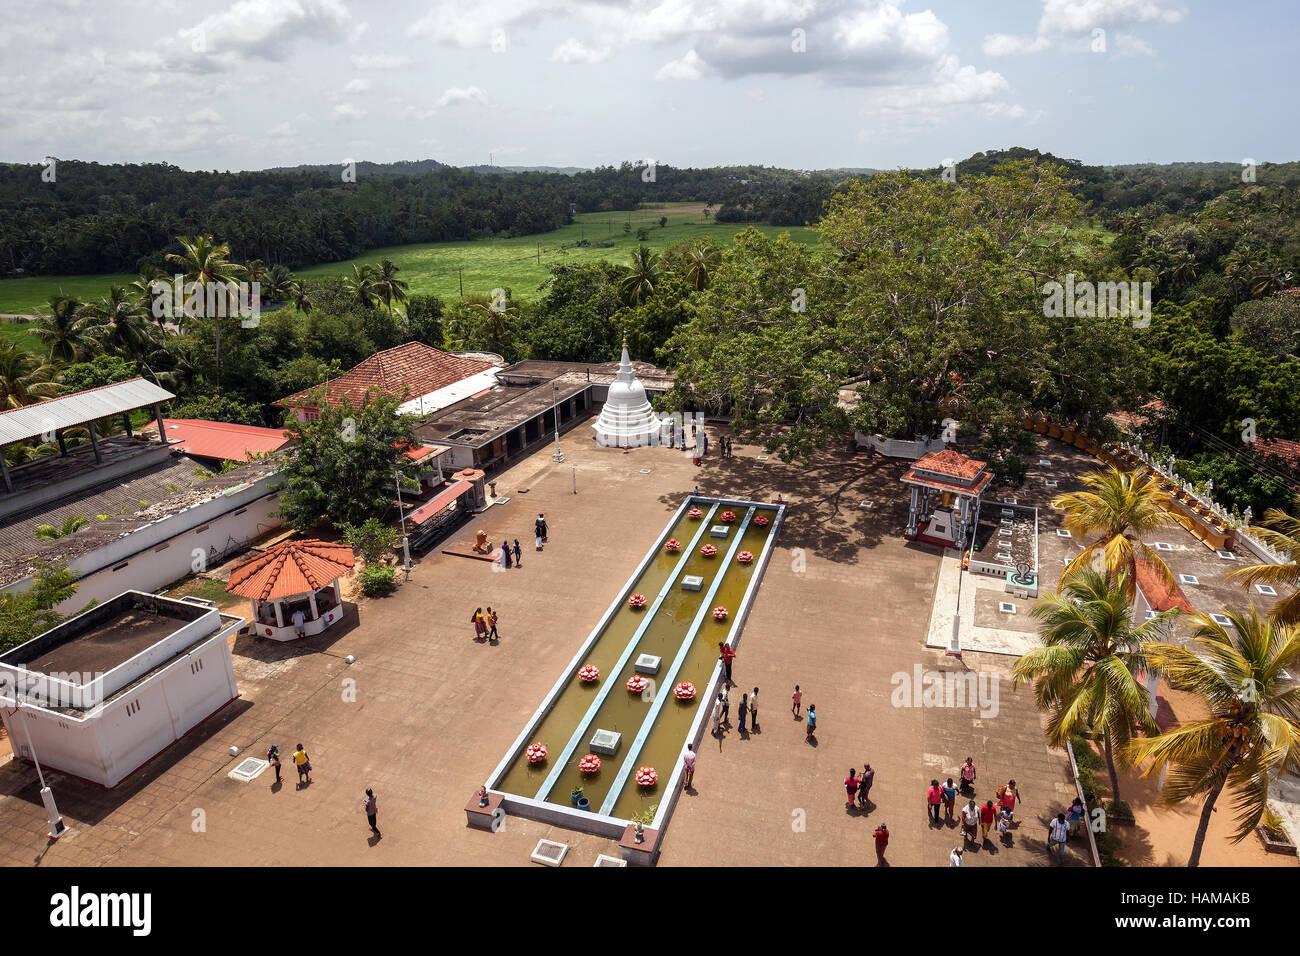 View of temple grounds, Weherahena Temple, Mata§ra, Southern Province, Sri Lanka - Stock Image